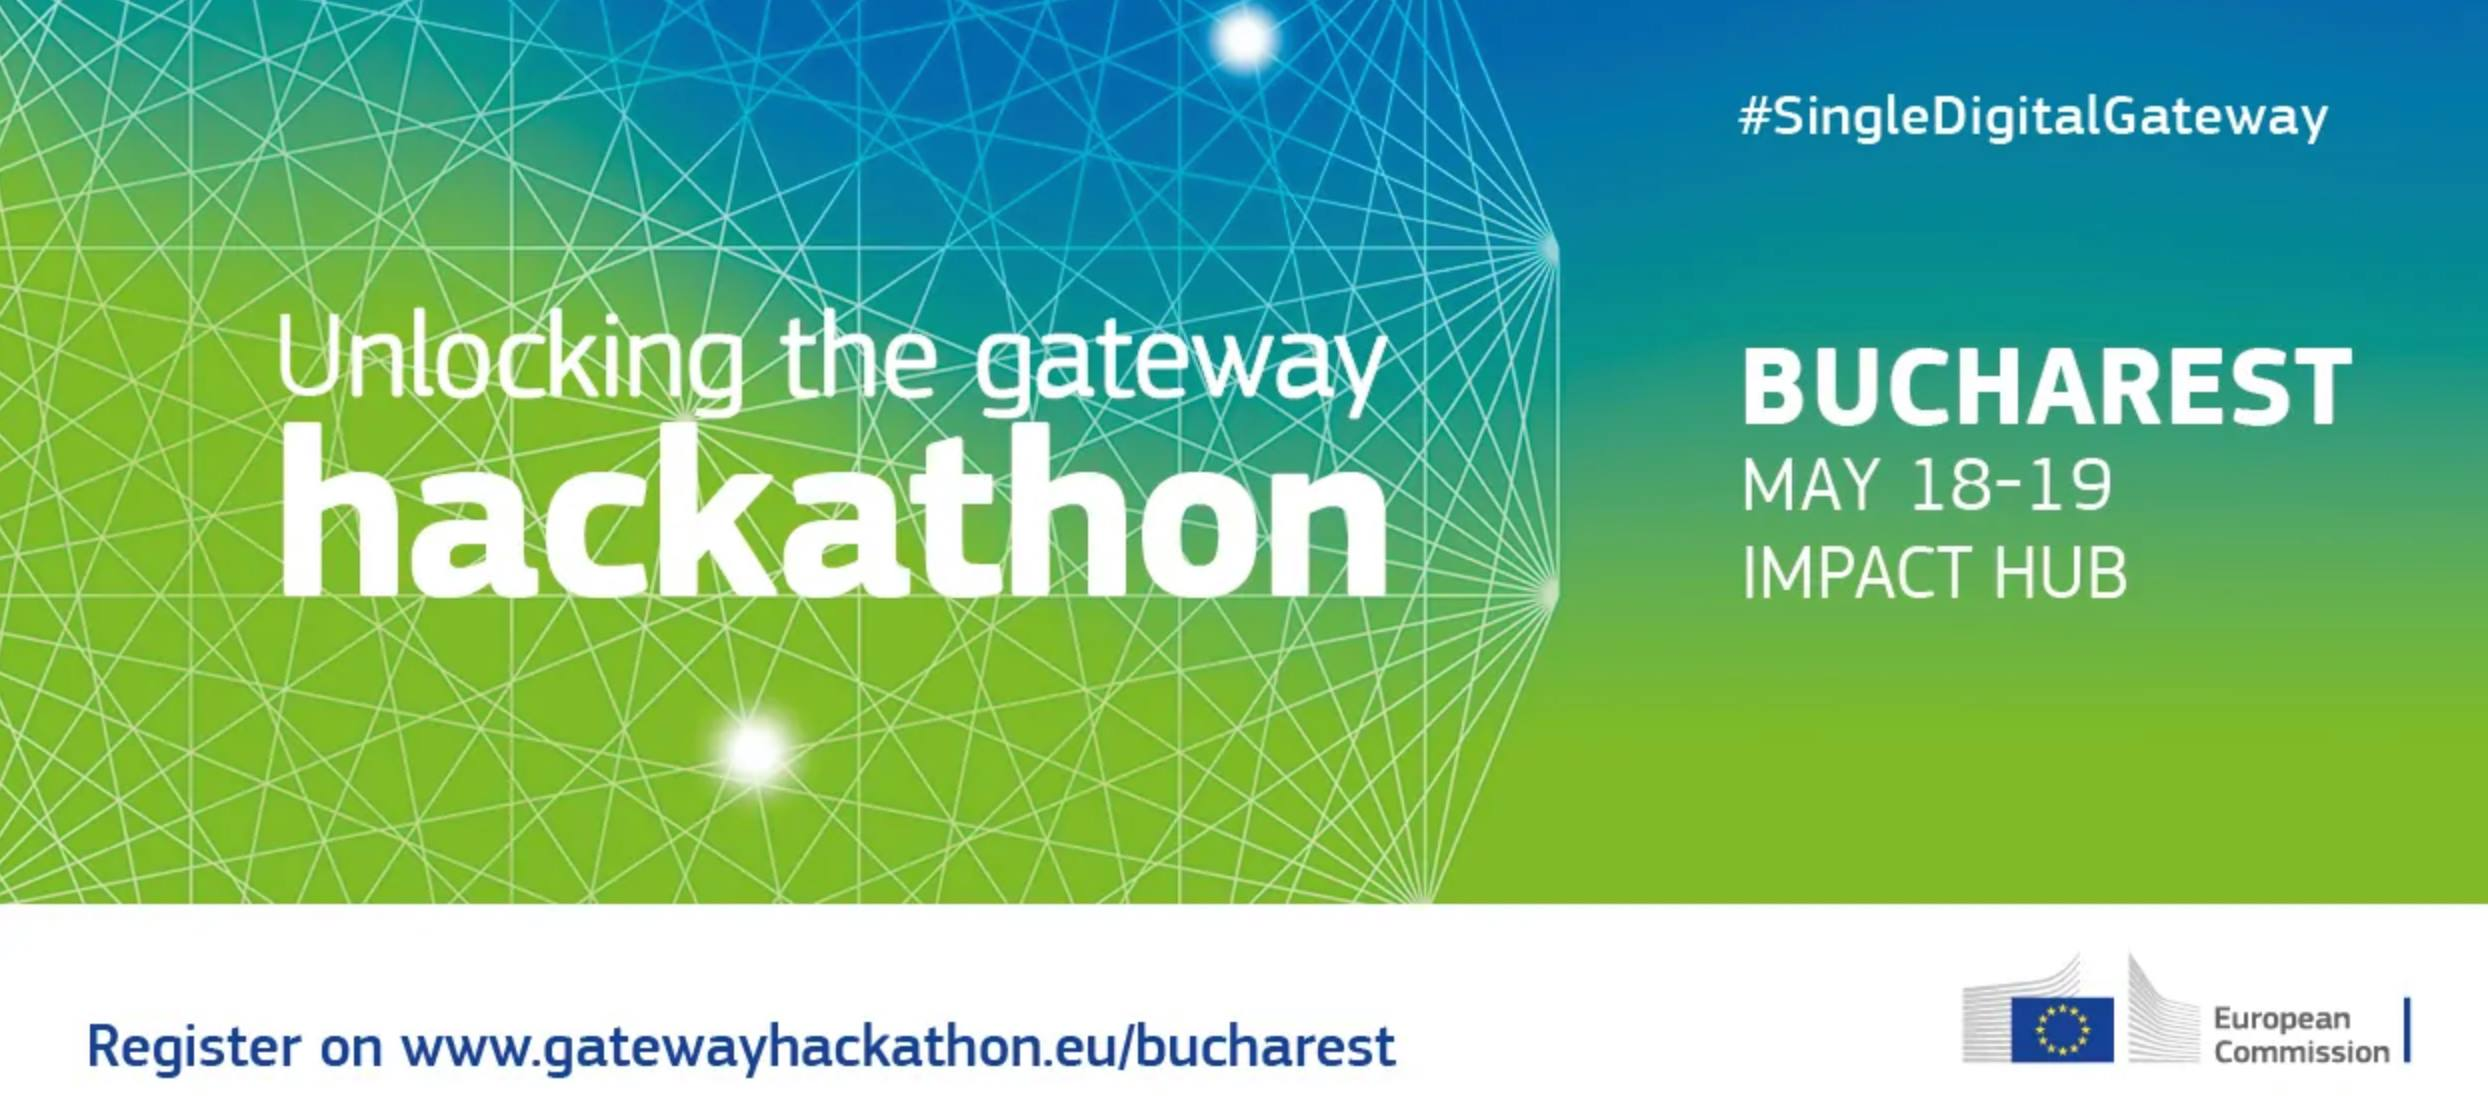 Single Digital Gateway Hackathon